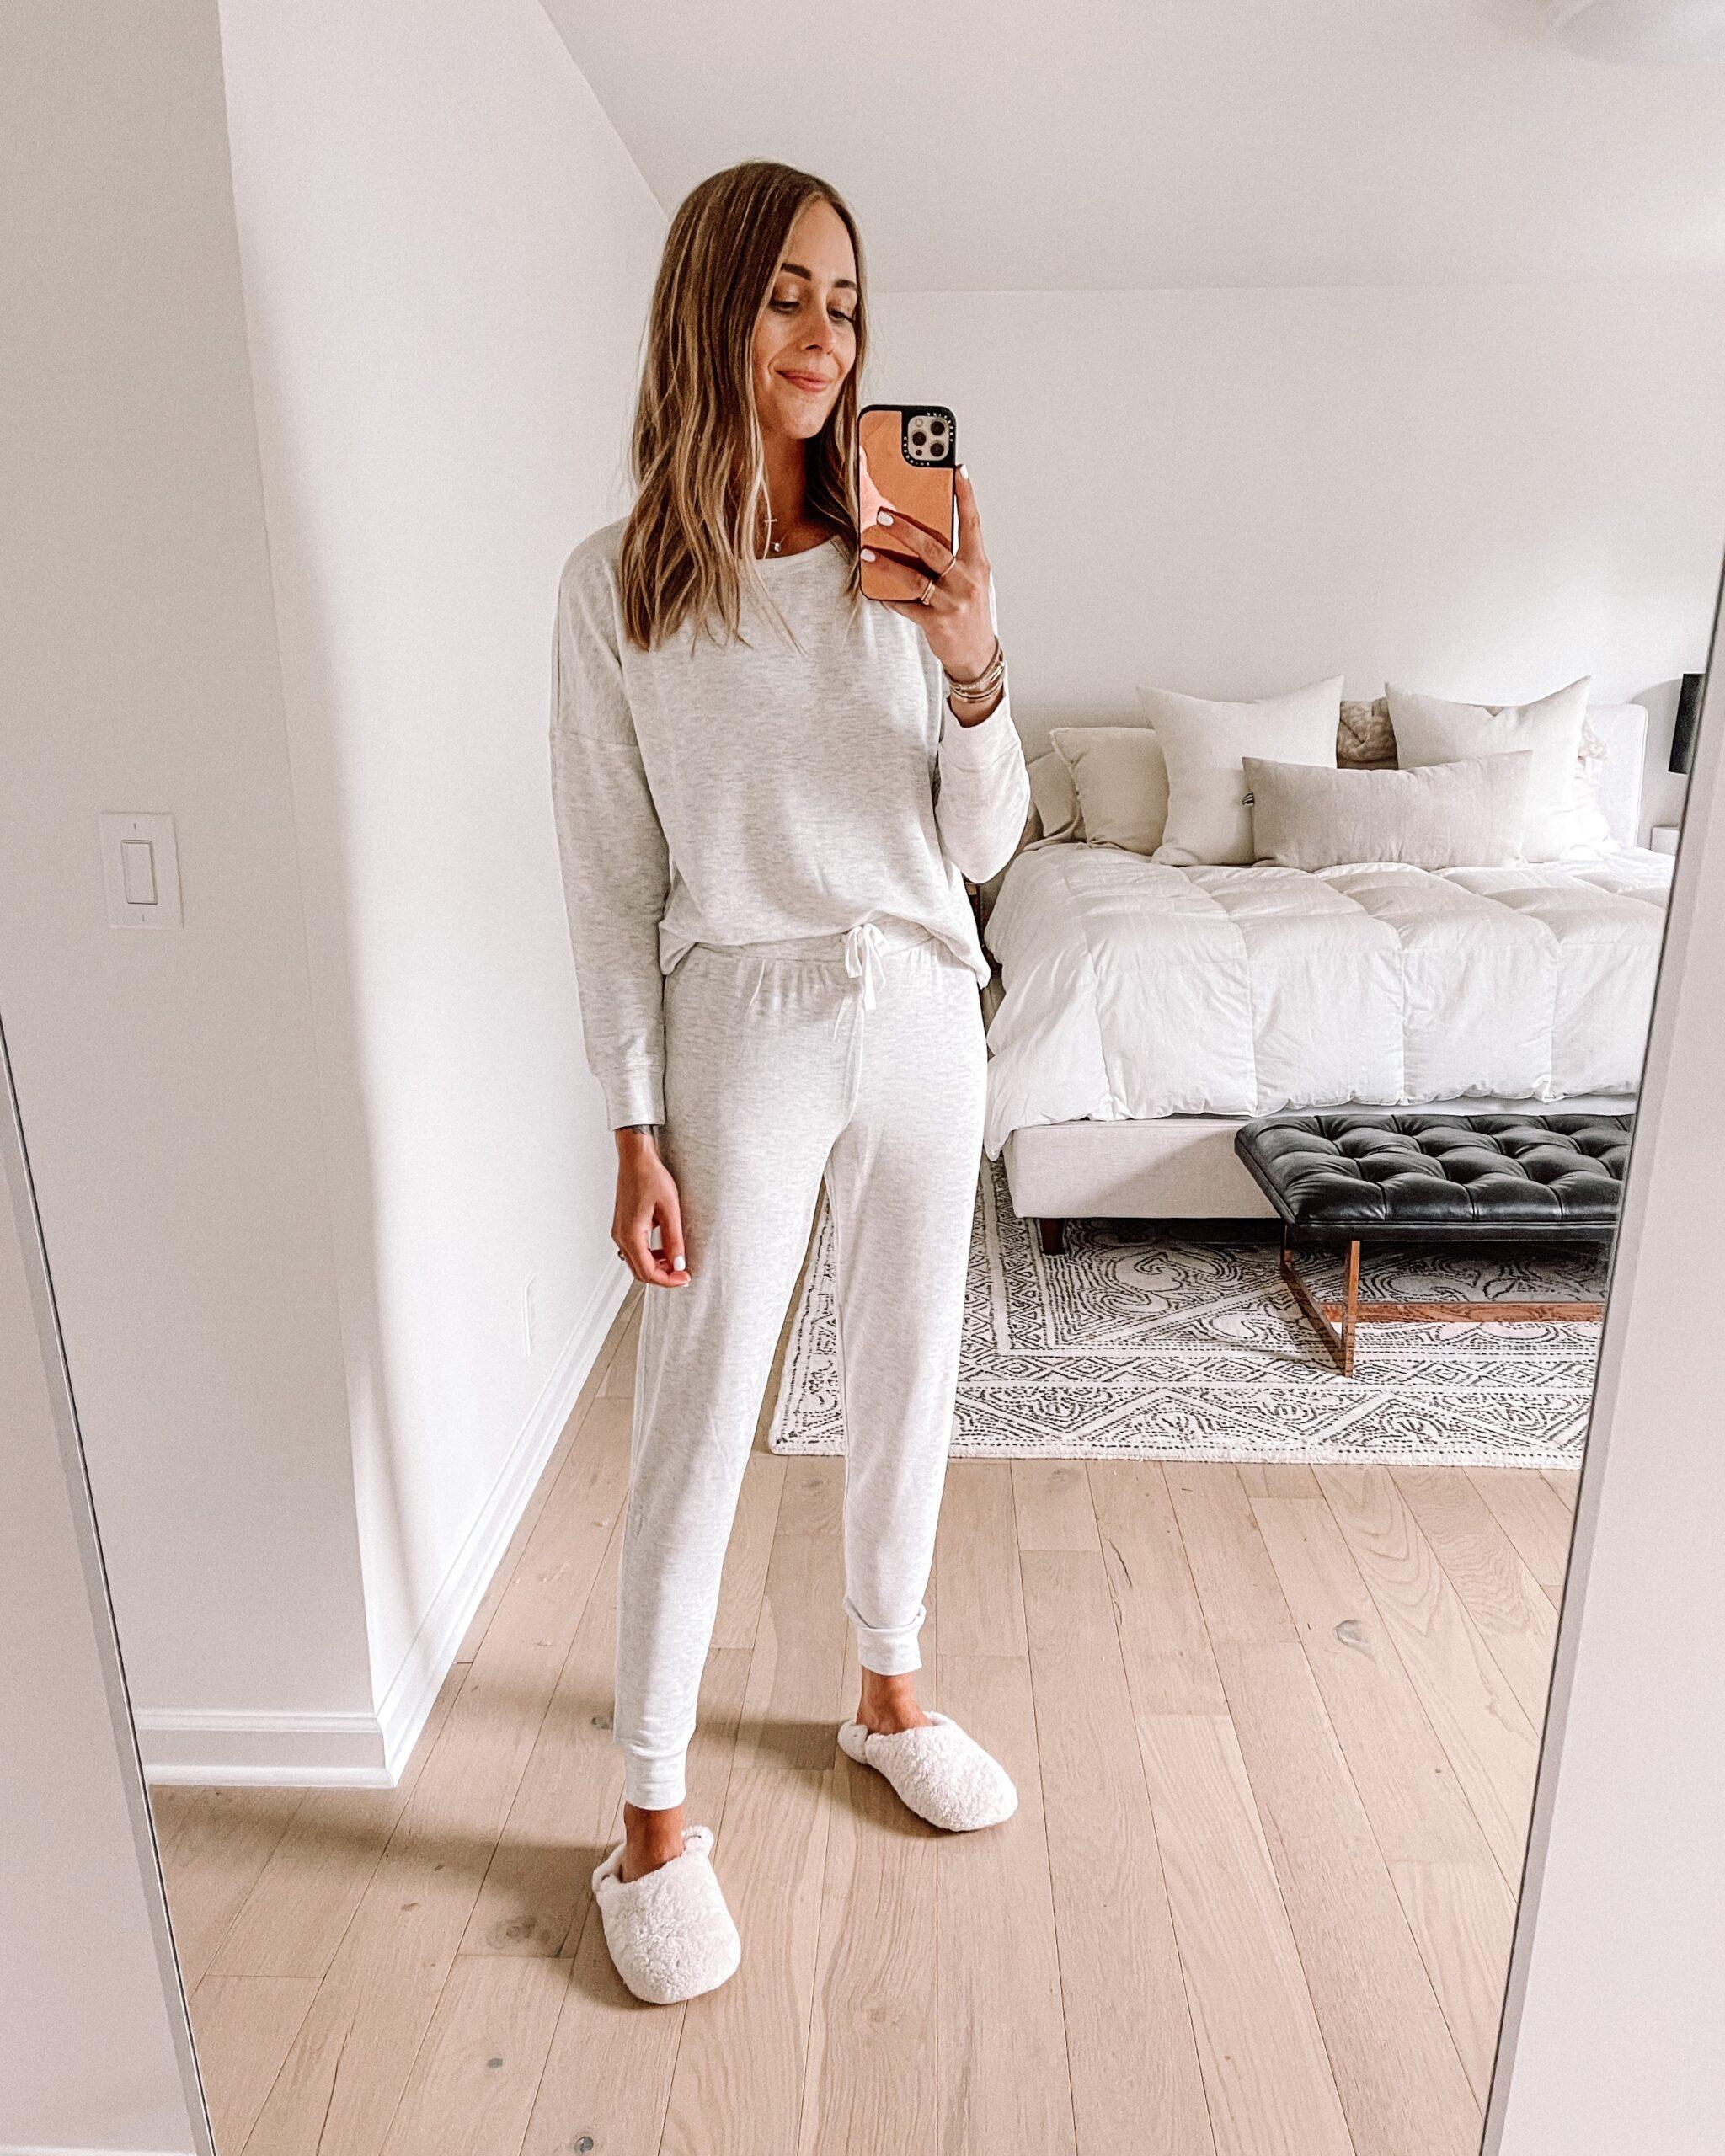 Fashion Jackson Wearing Amazon Fashion Grey Lounge Set Fuzzy Slippers